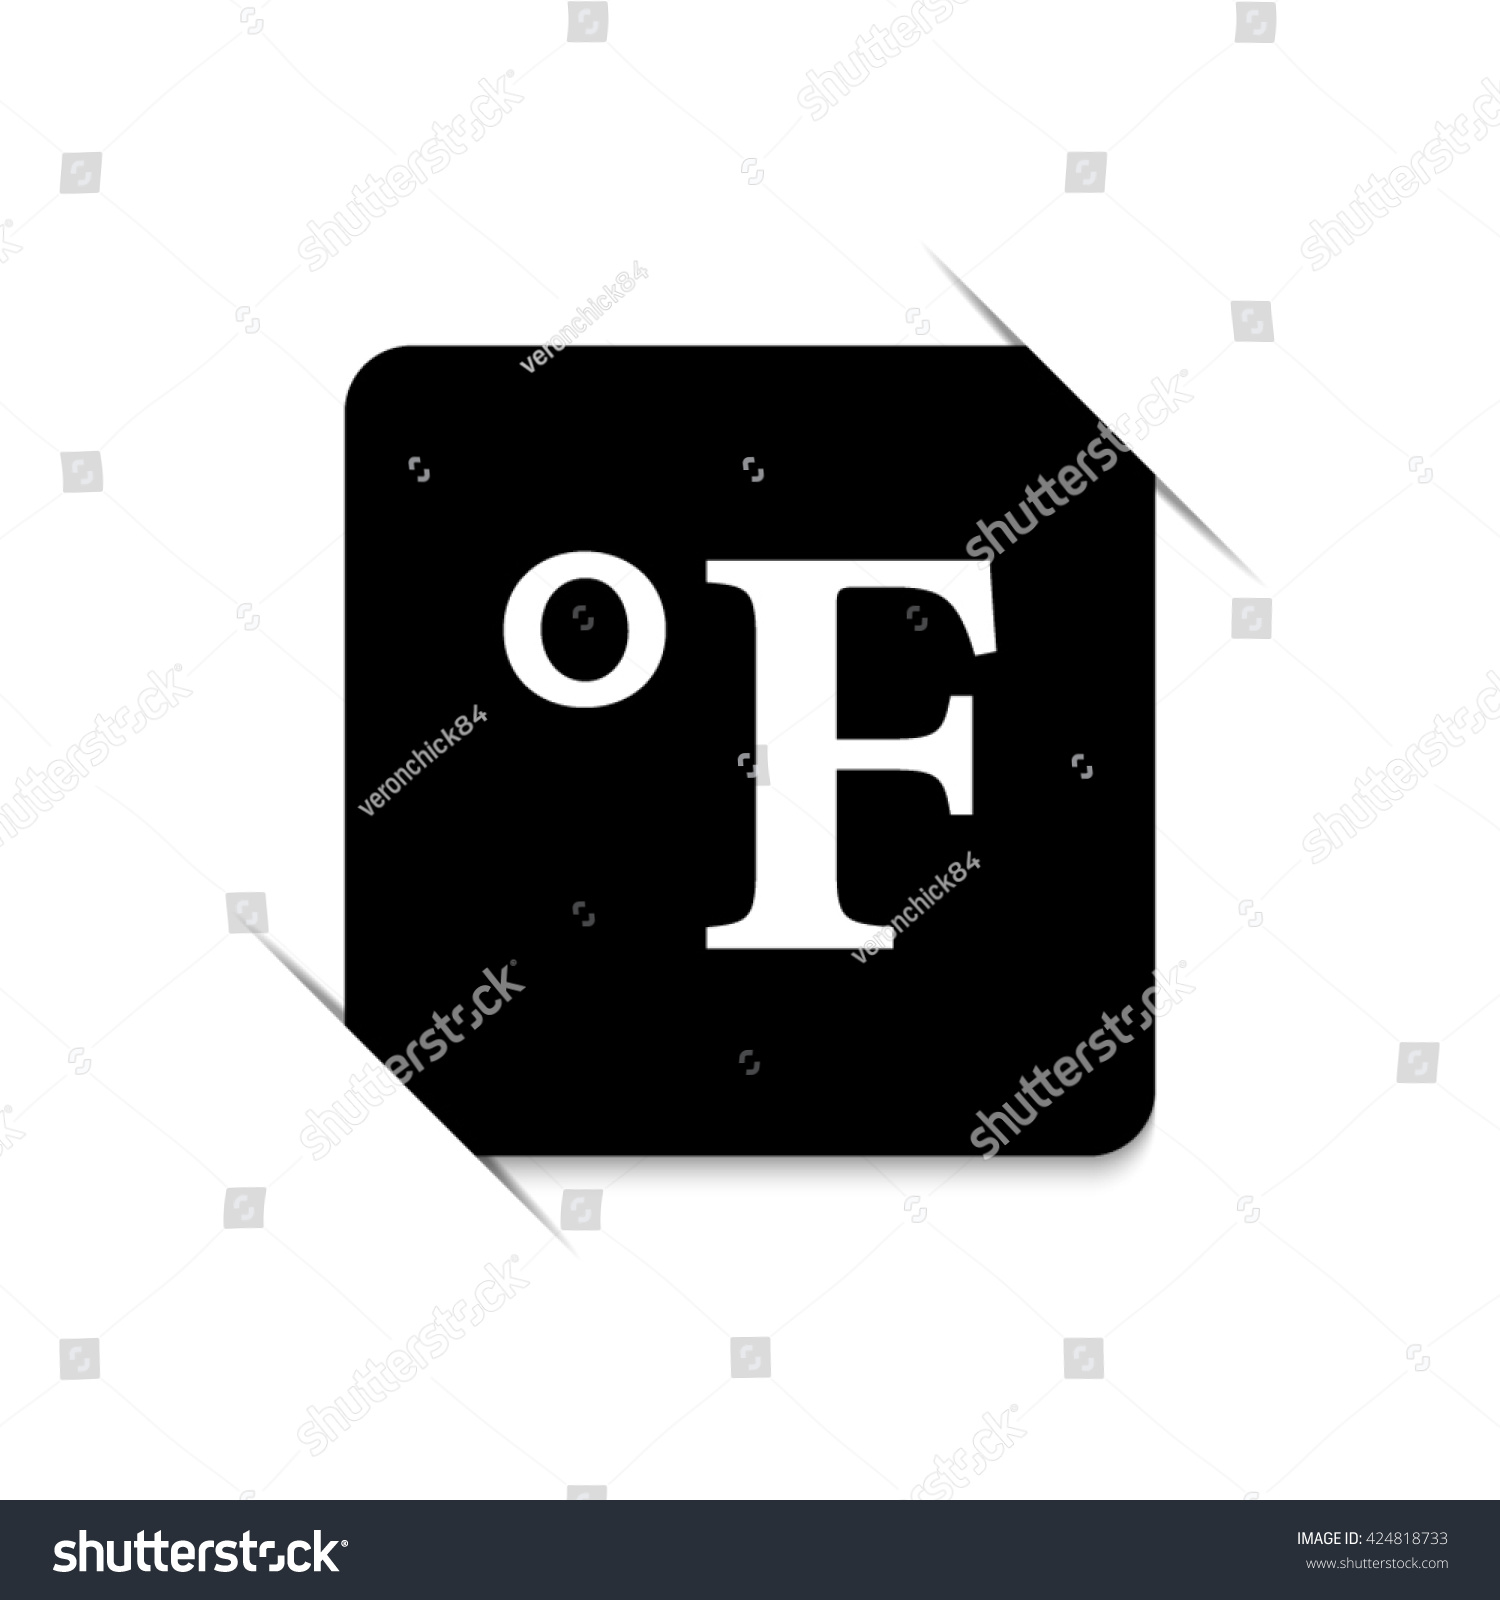 Degrees fahrenheit black vector icon stock vector 424818733 degrees fahrenheit black vector icon biocorpaavc Choice Image